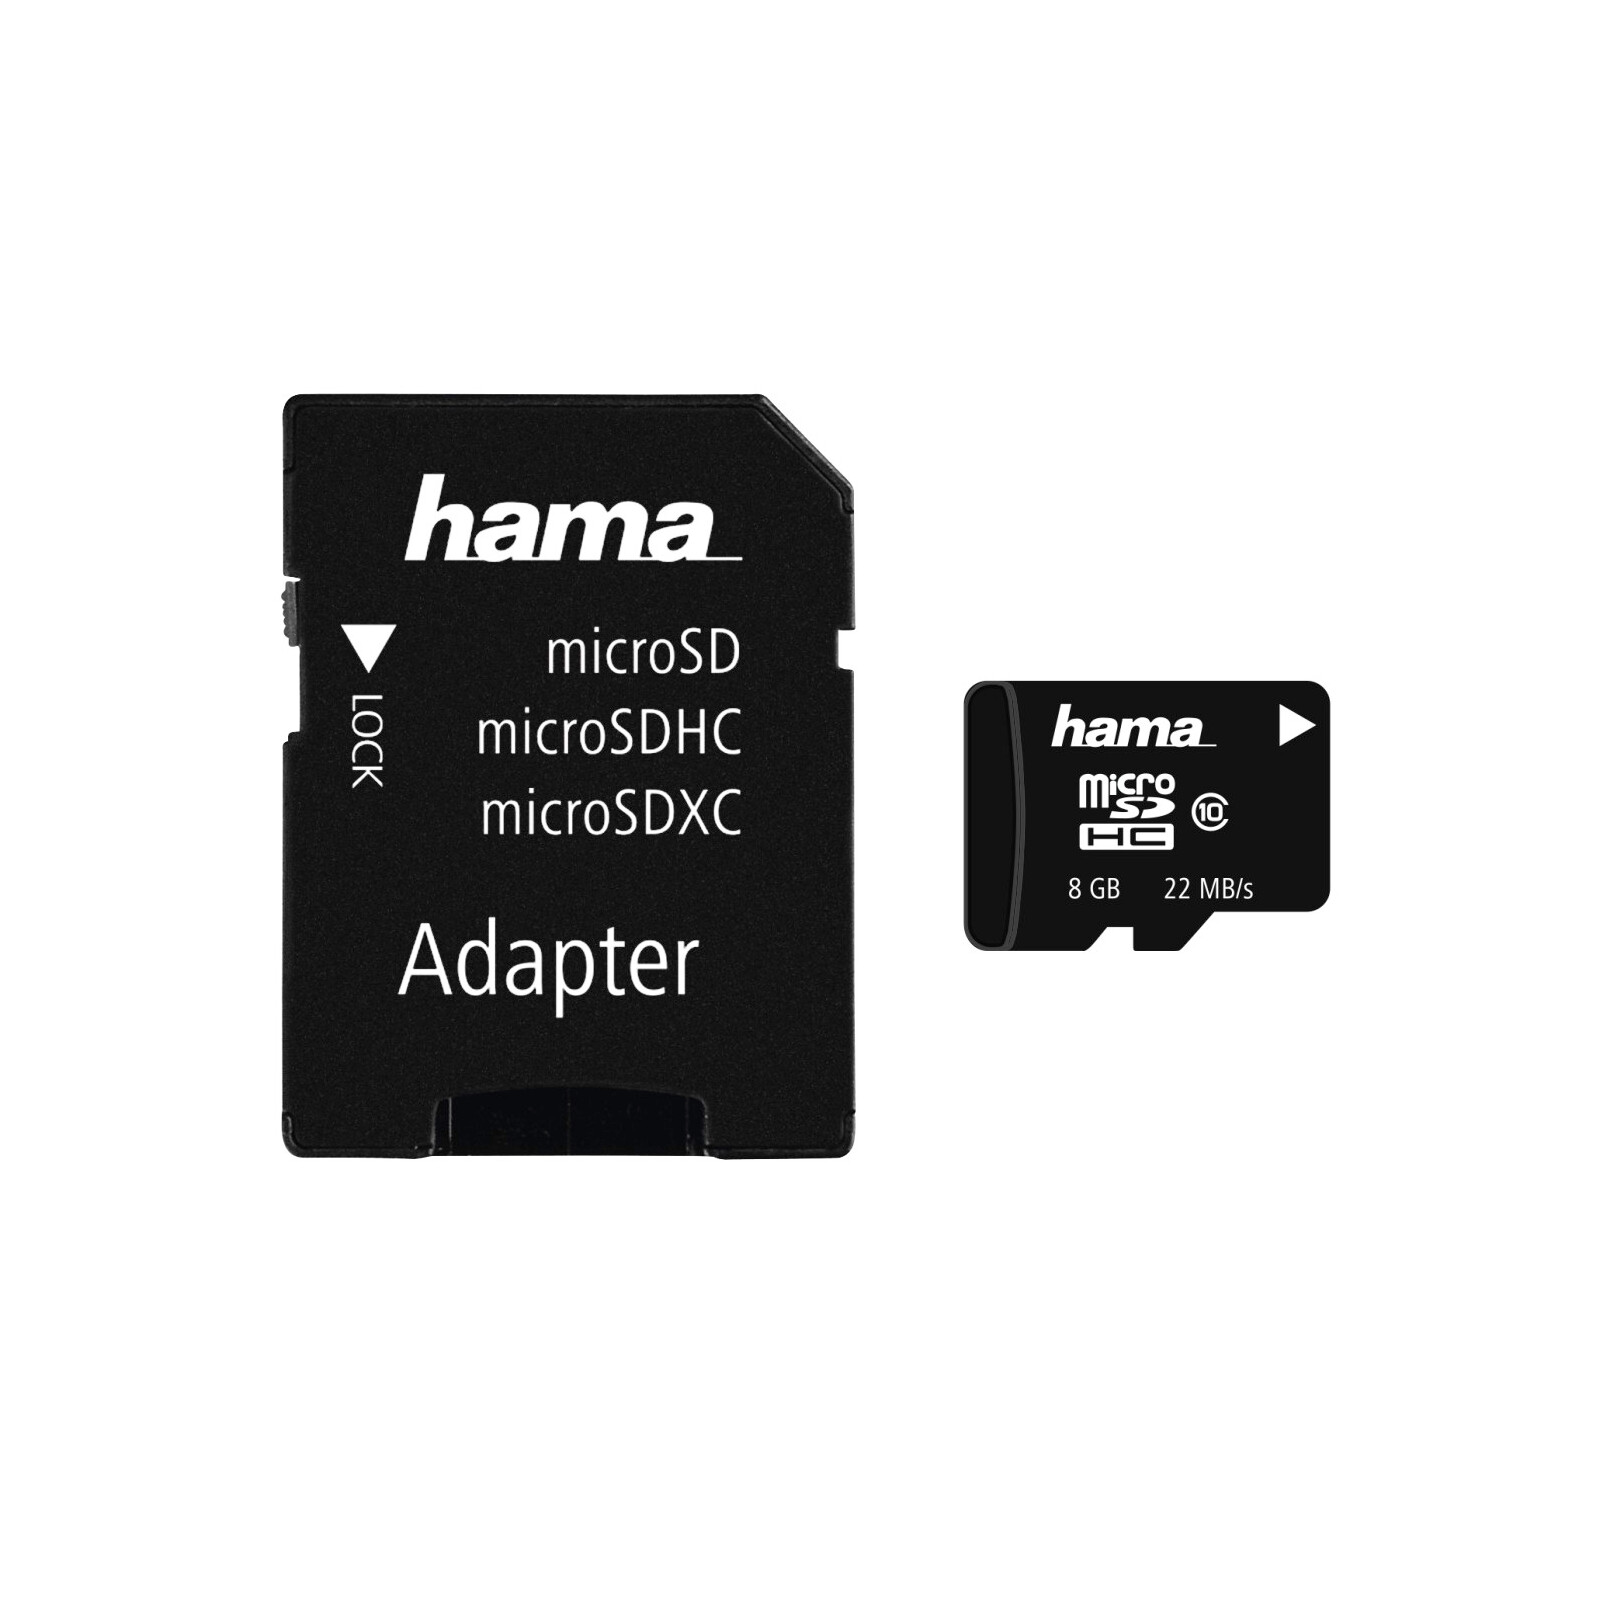 Hama microSDHC 8GB 22MB/s